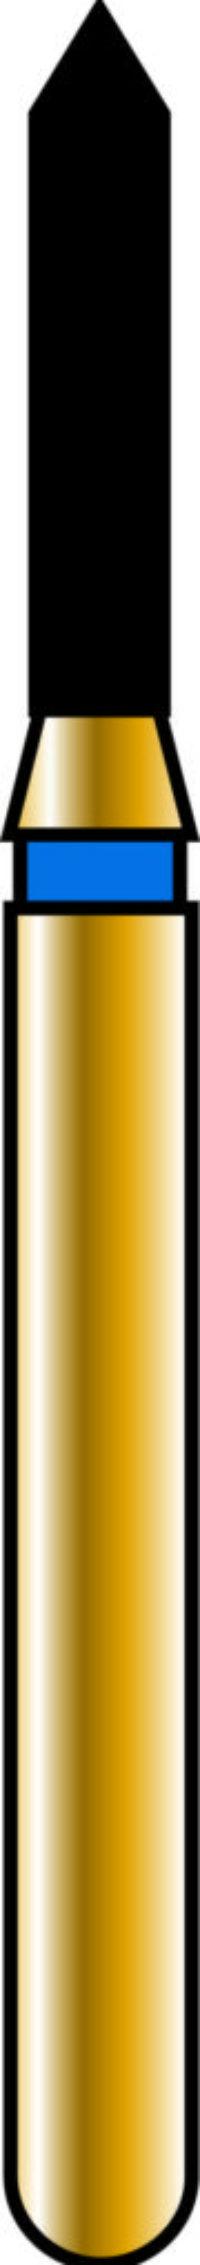 Pointed Cylinder 12-6mm Gold Diamond Bur